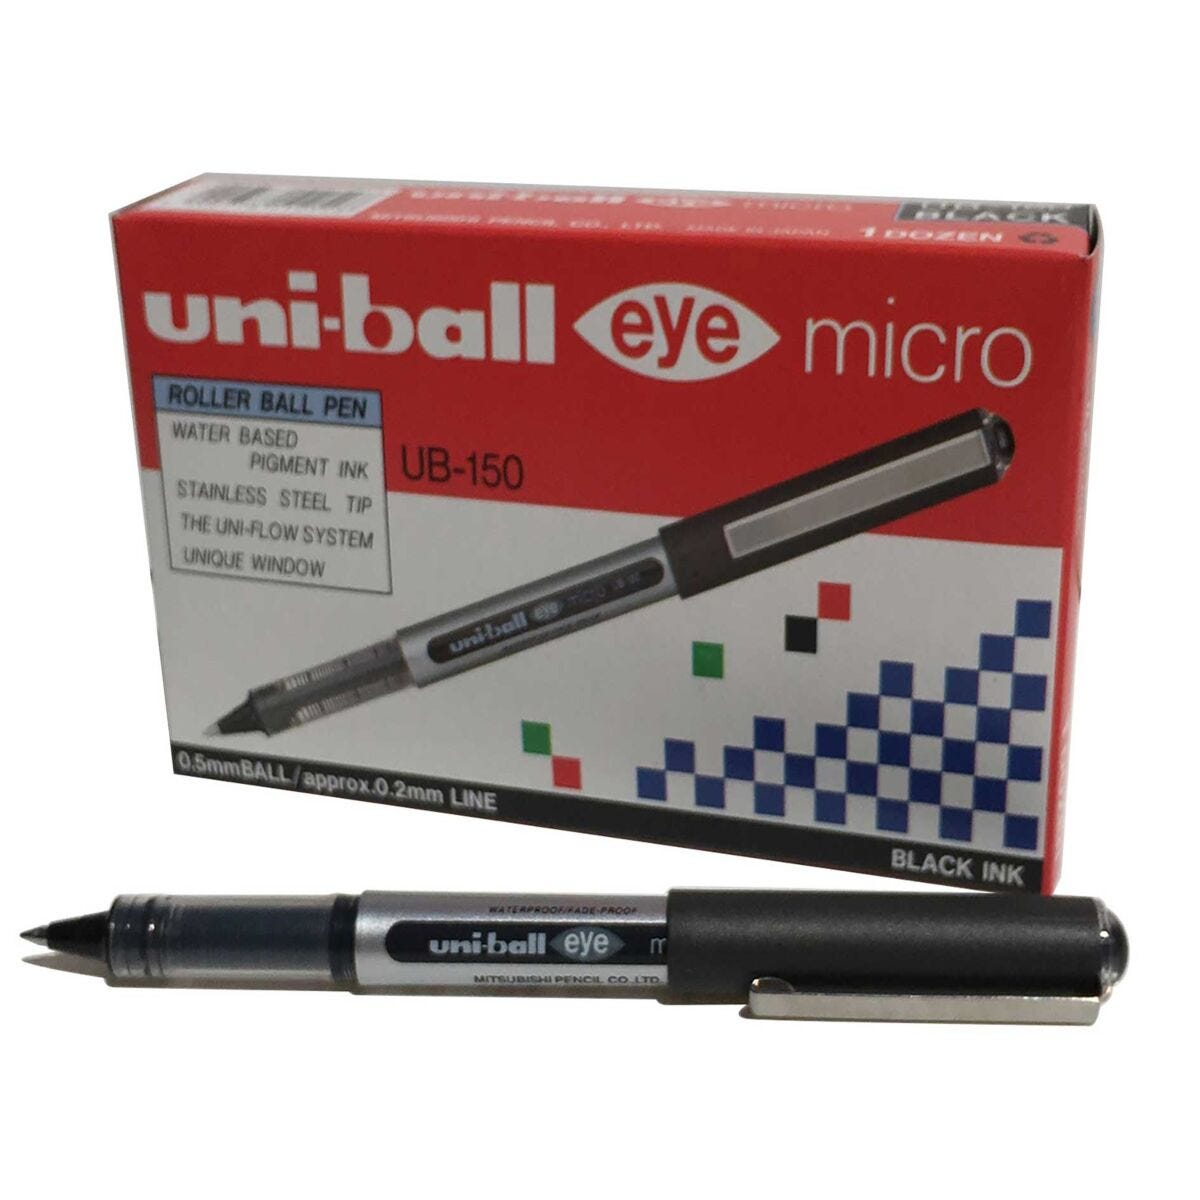 uni-ball UB150 Eye Rollerball Pack of 12